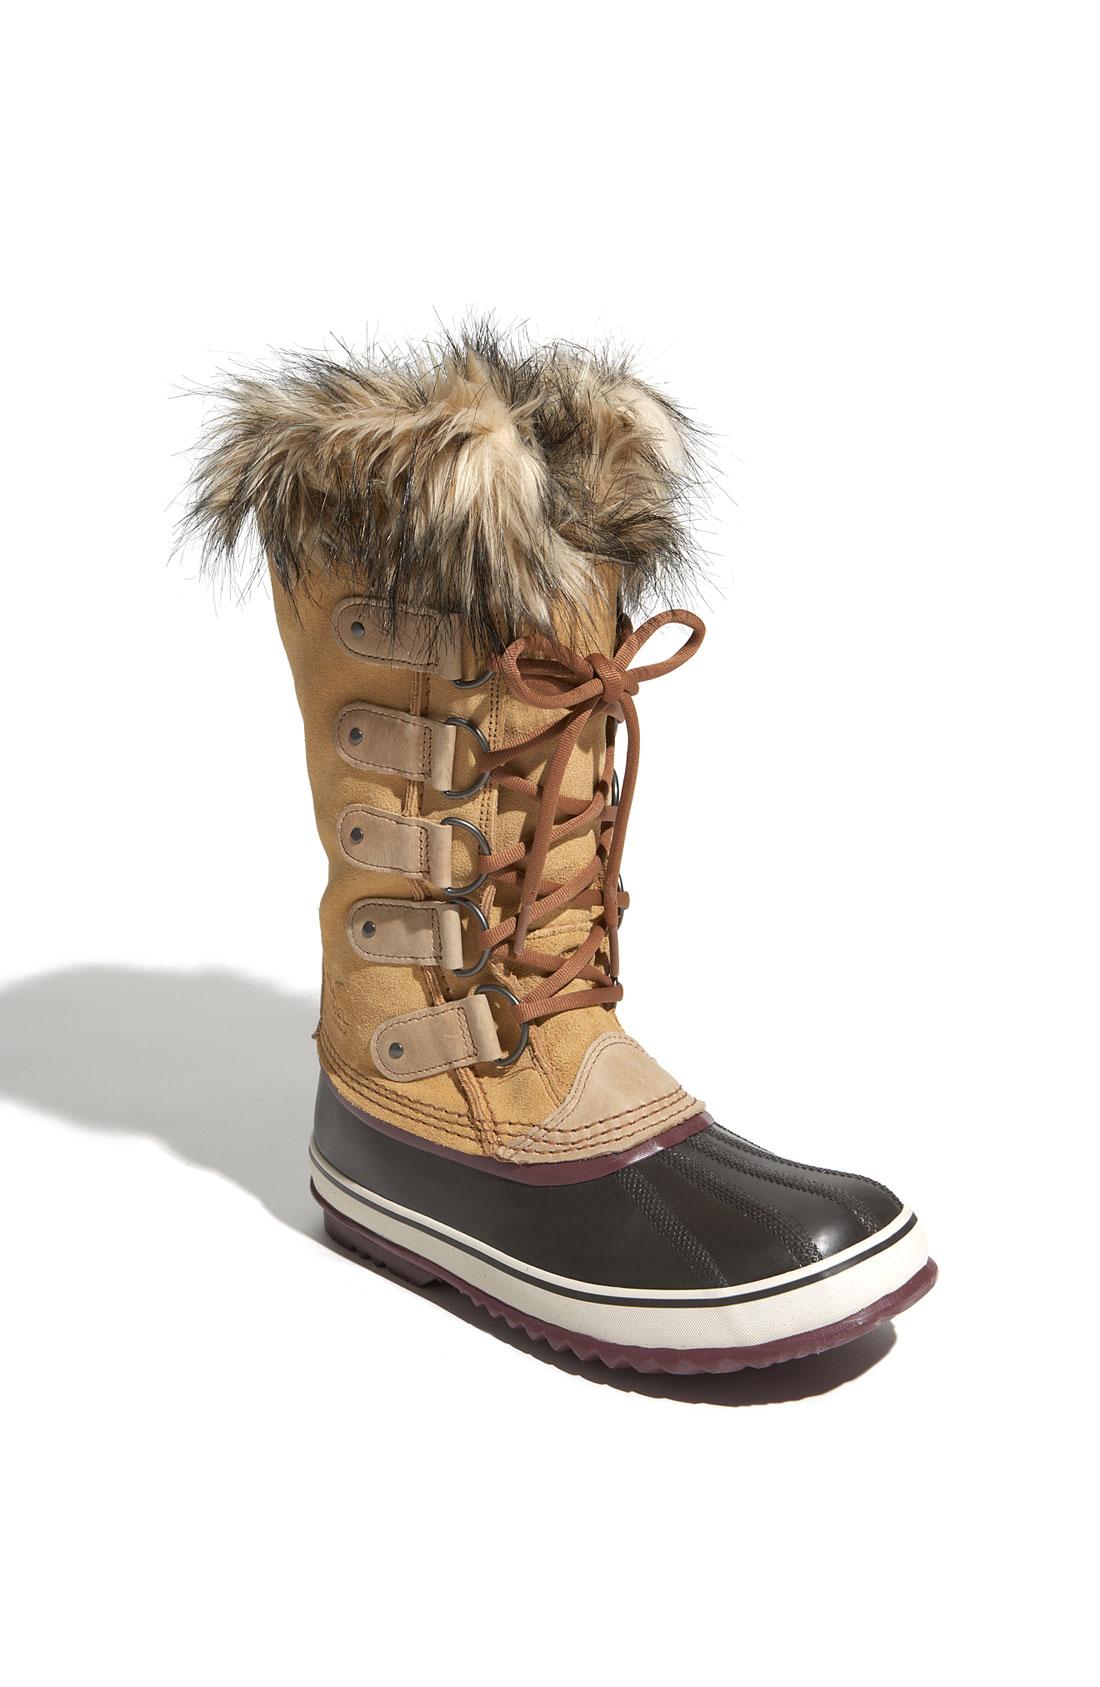 sorel joan of arctic boot in brown tan lyst. Black Bedroom Furniture Sets. Home Design Ideas